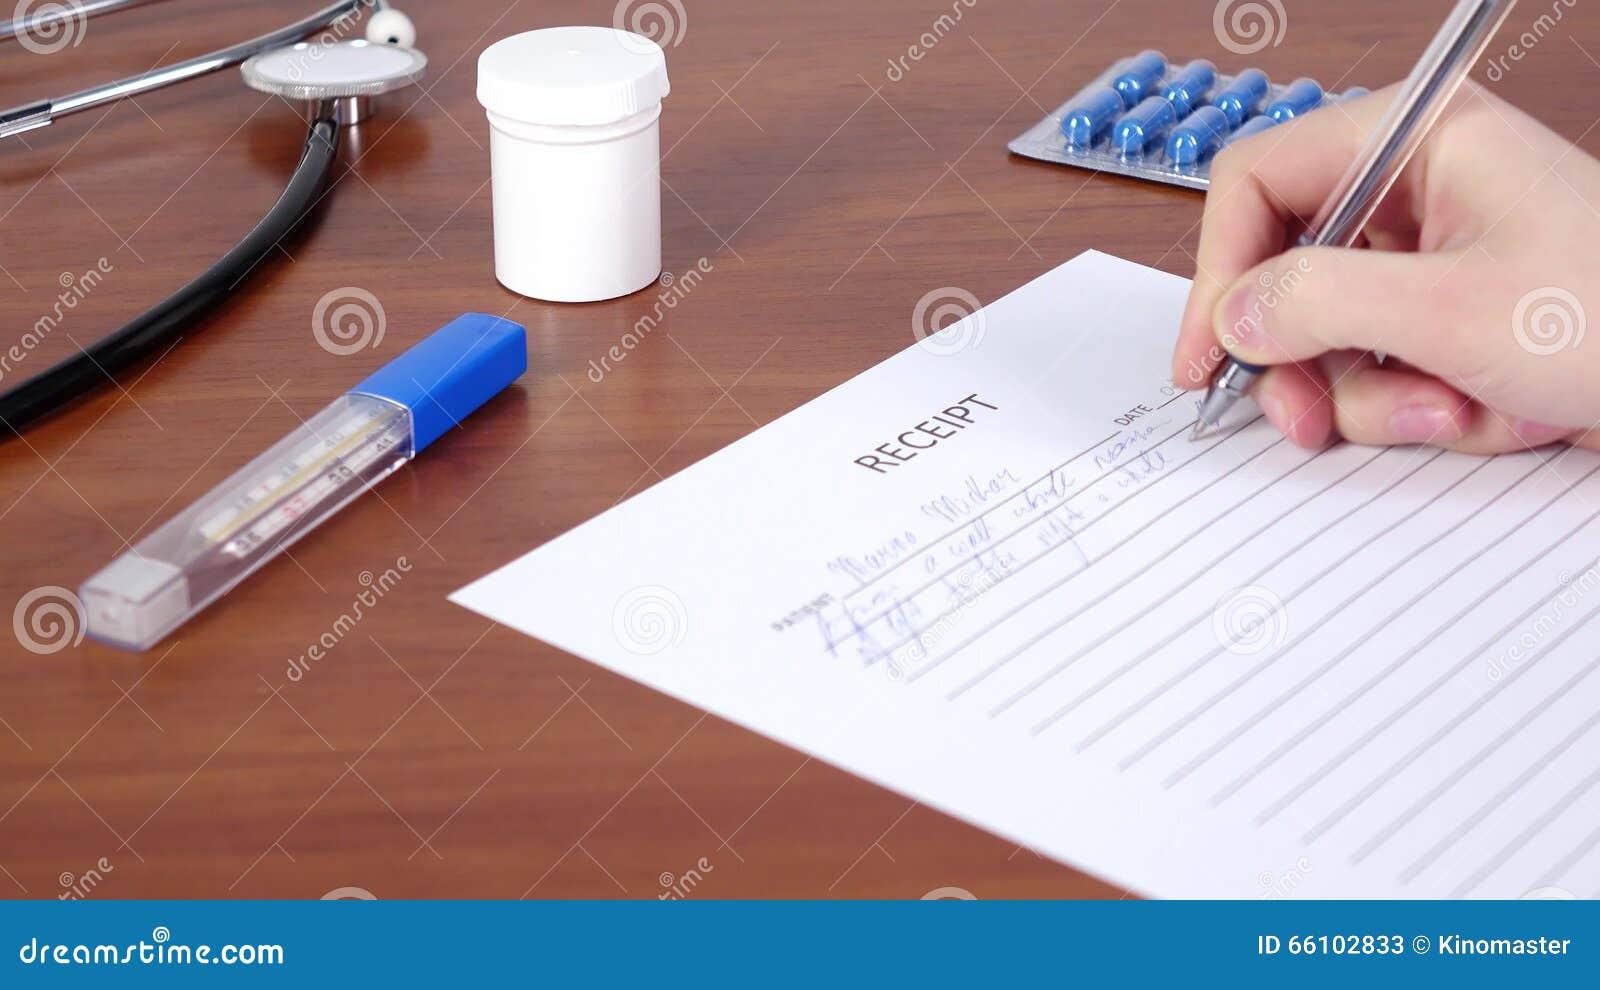 writing a receipt